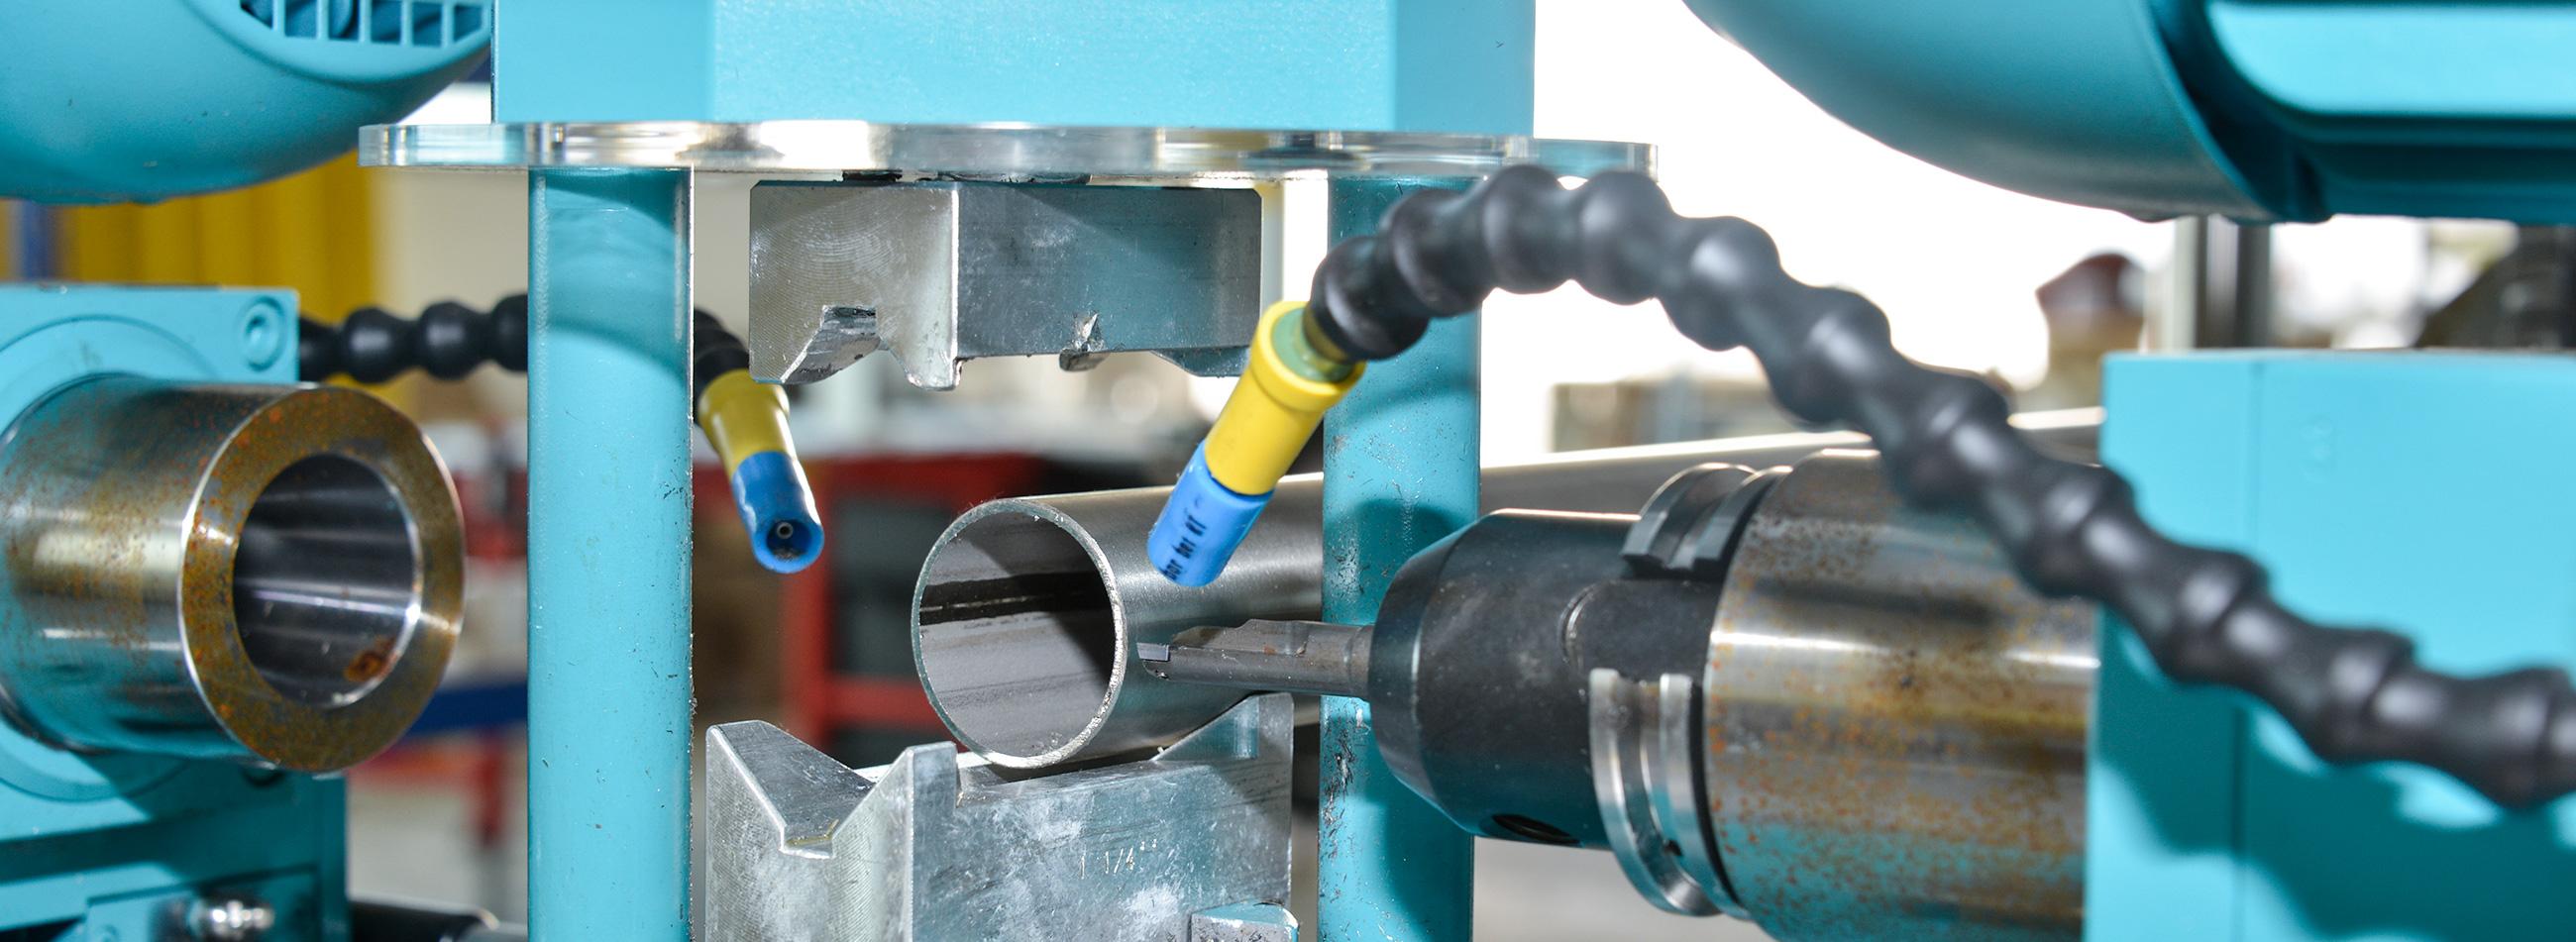 Industriefotografie Maschinenbau